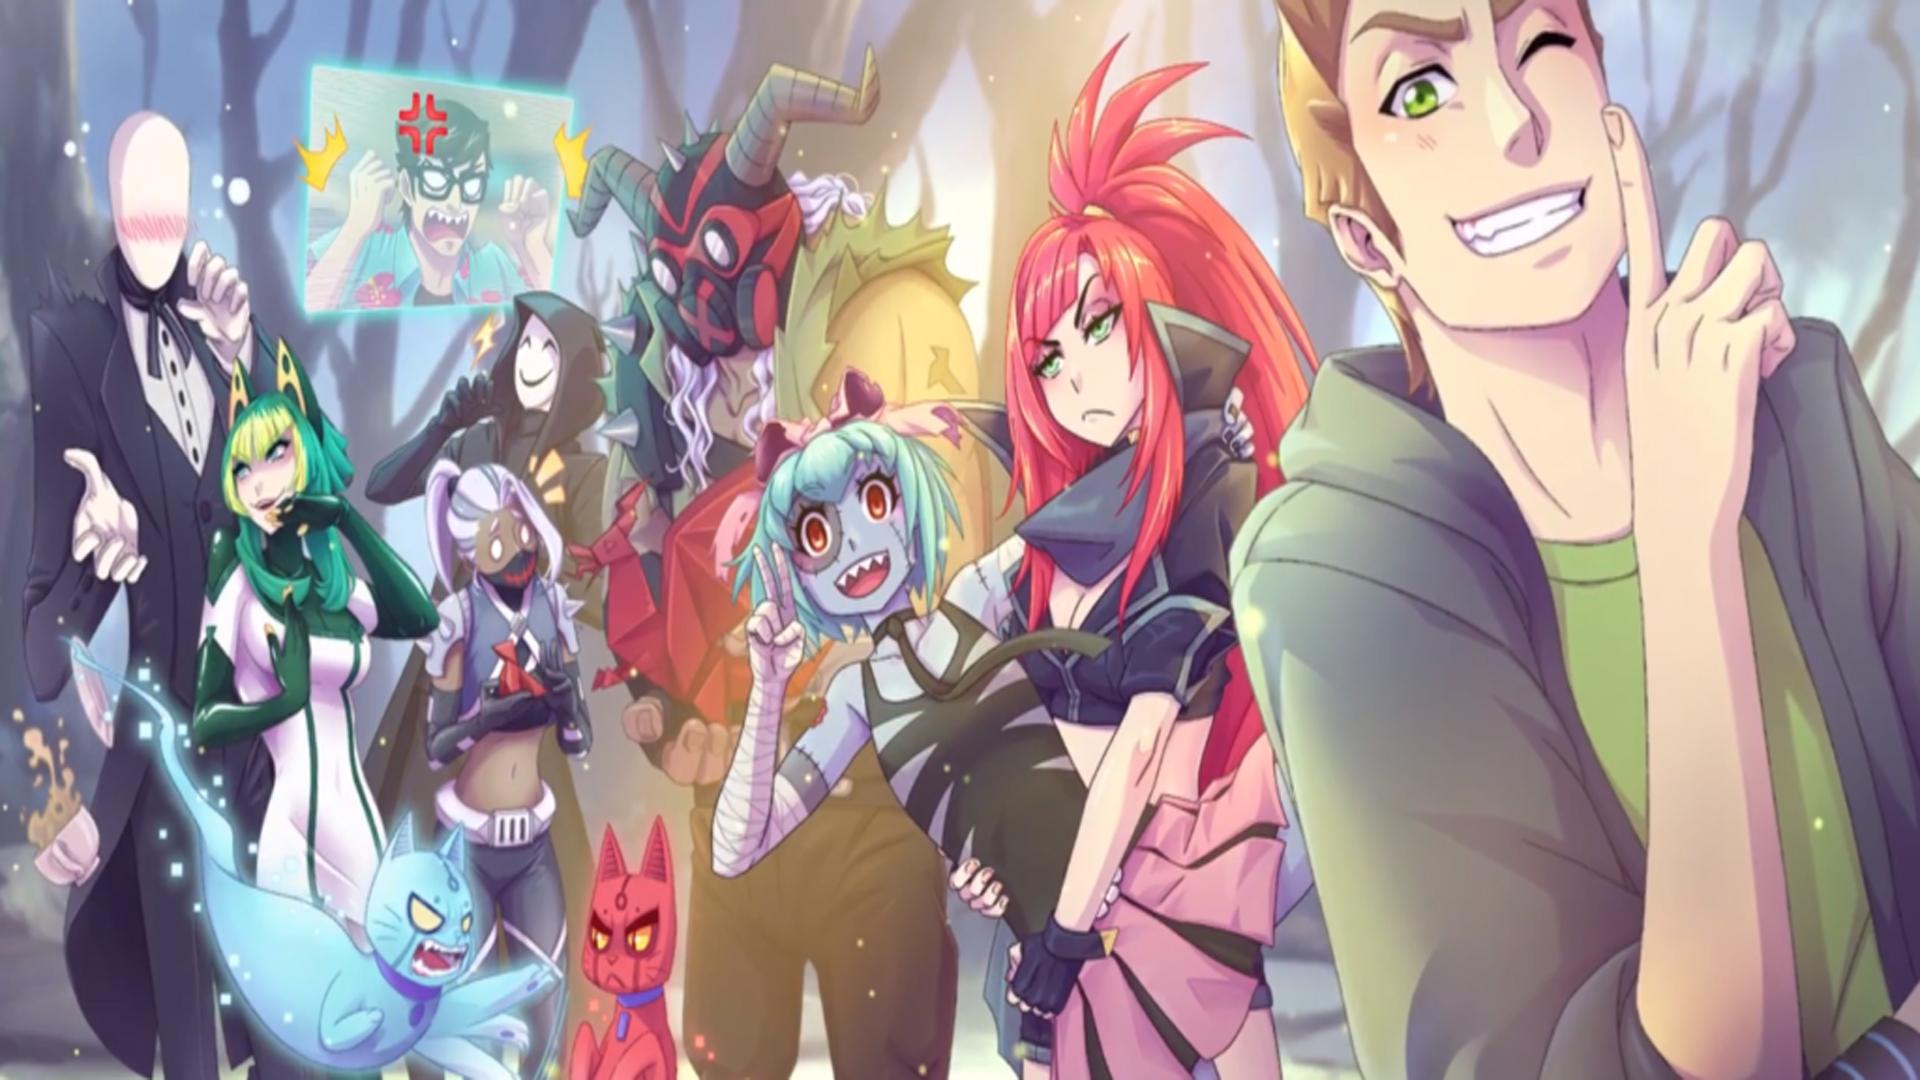 Unduh 67 Wallpaper Hd Anime Mask HD Paling Keren